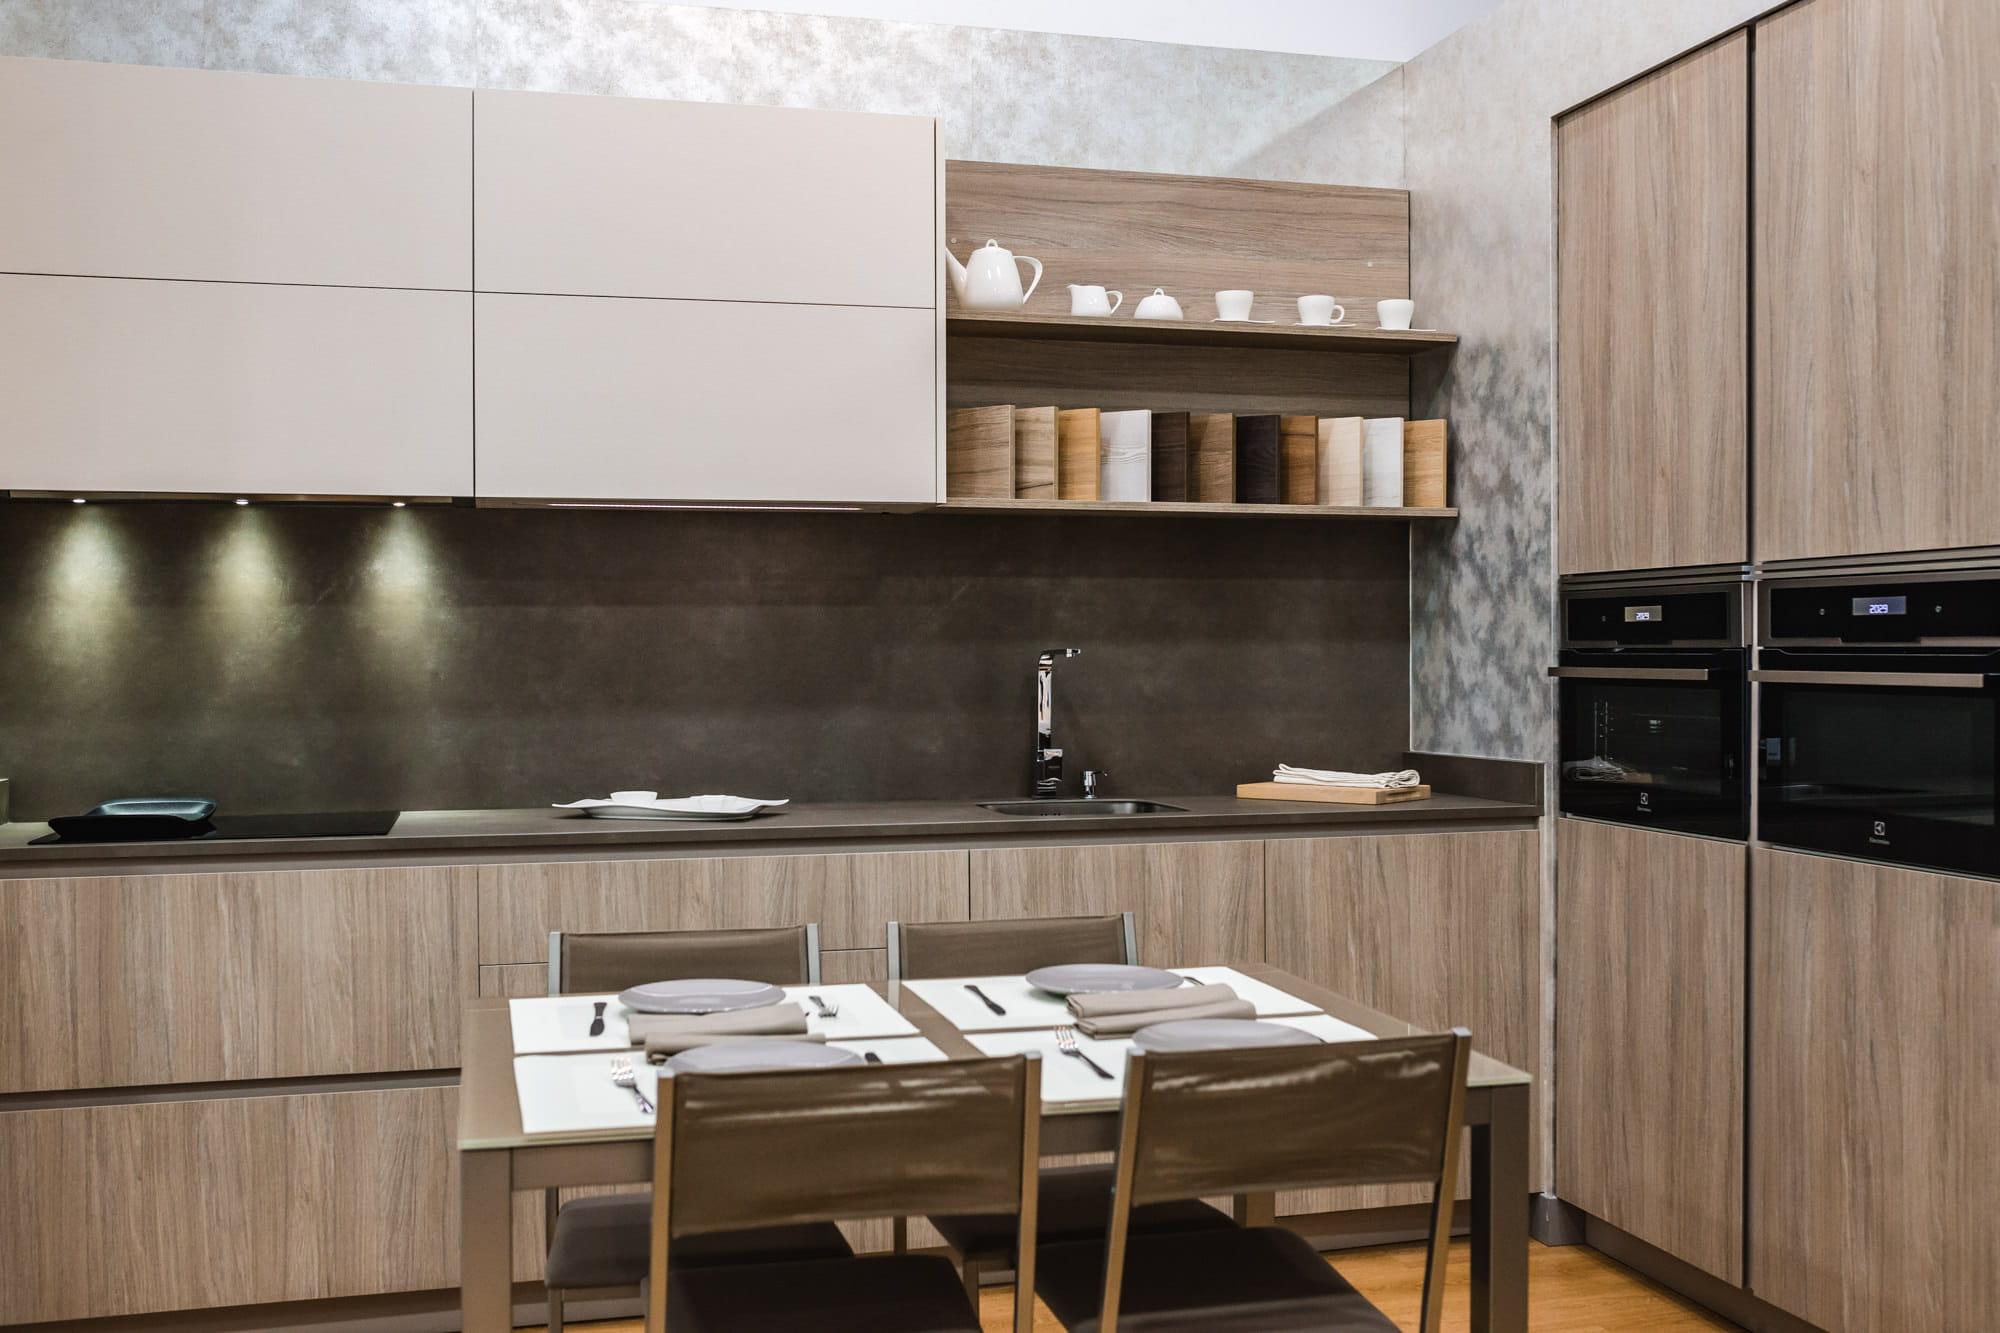 Cocinas modernas mucho m s que un espacio para cocinar - Cocinas de cocinar ...